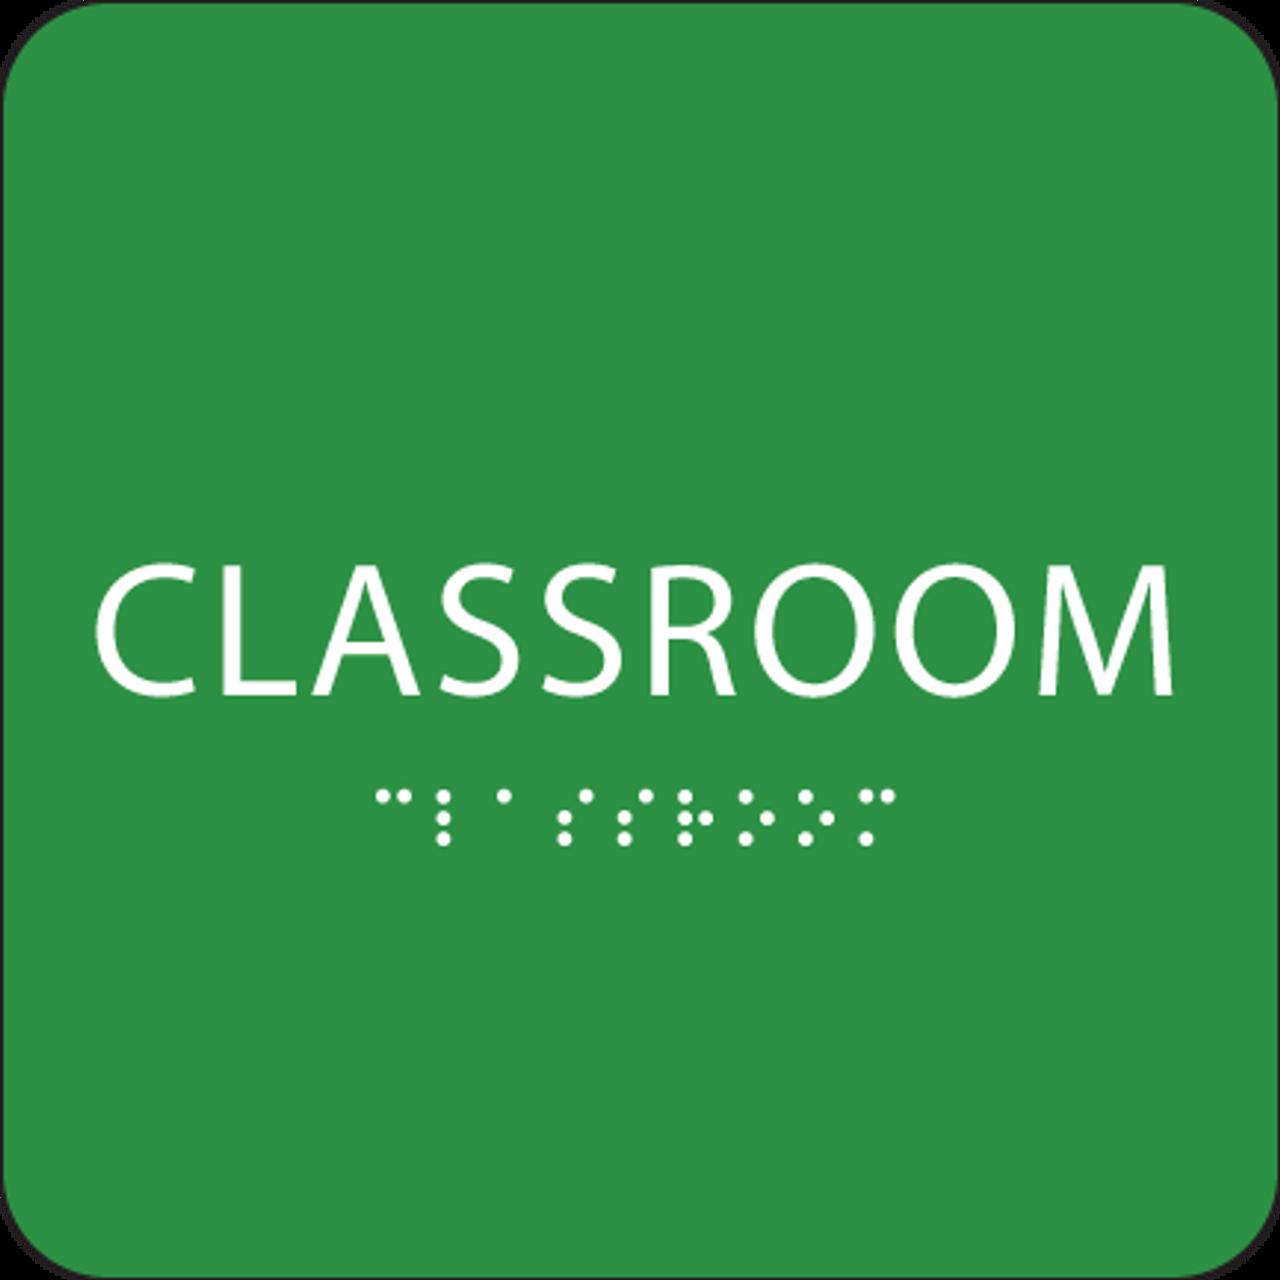 Green Classroom ADA Sign